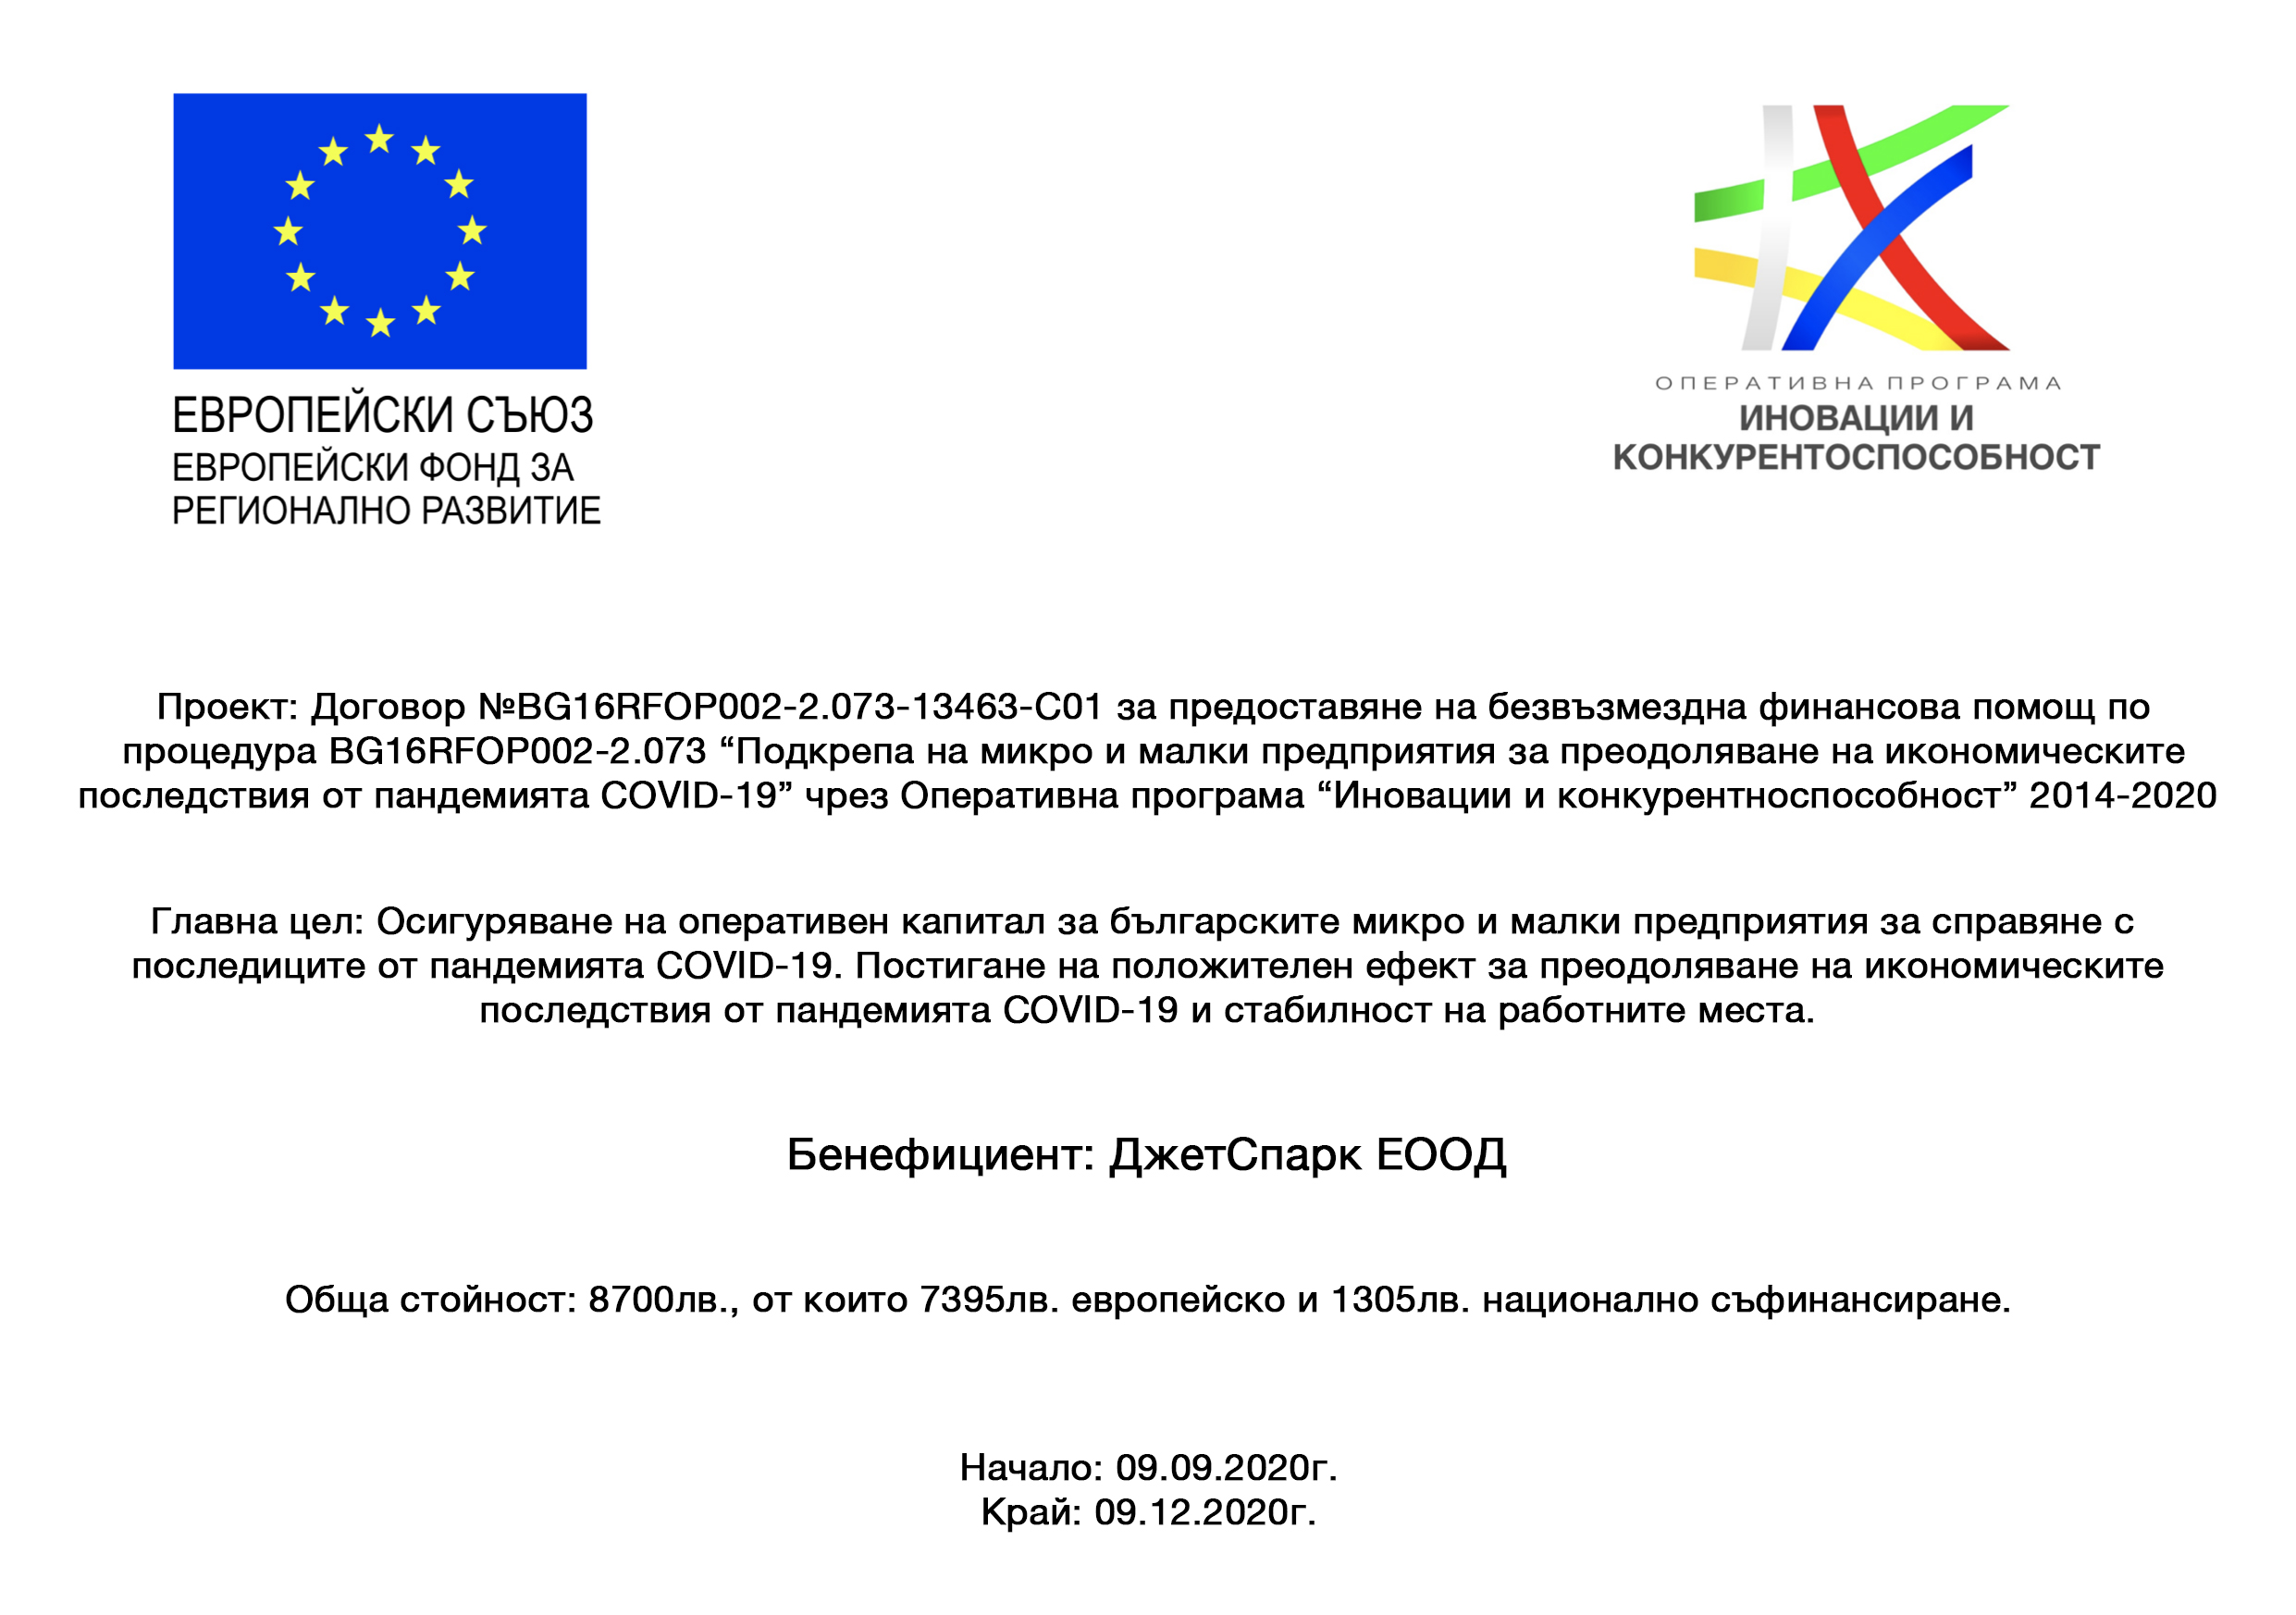 ERDF support